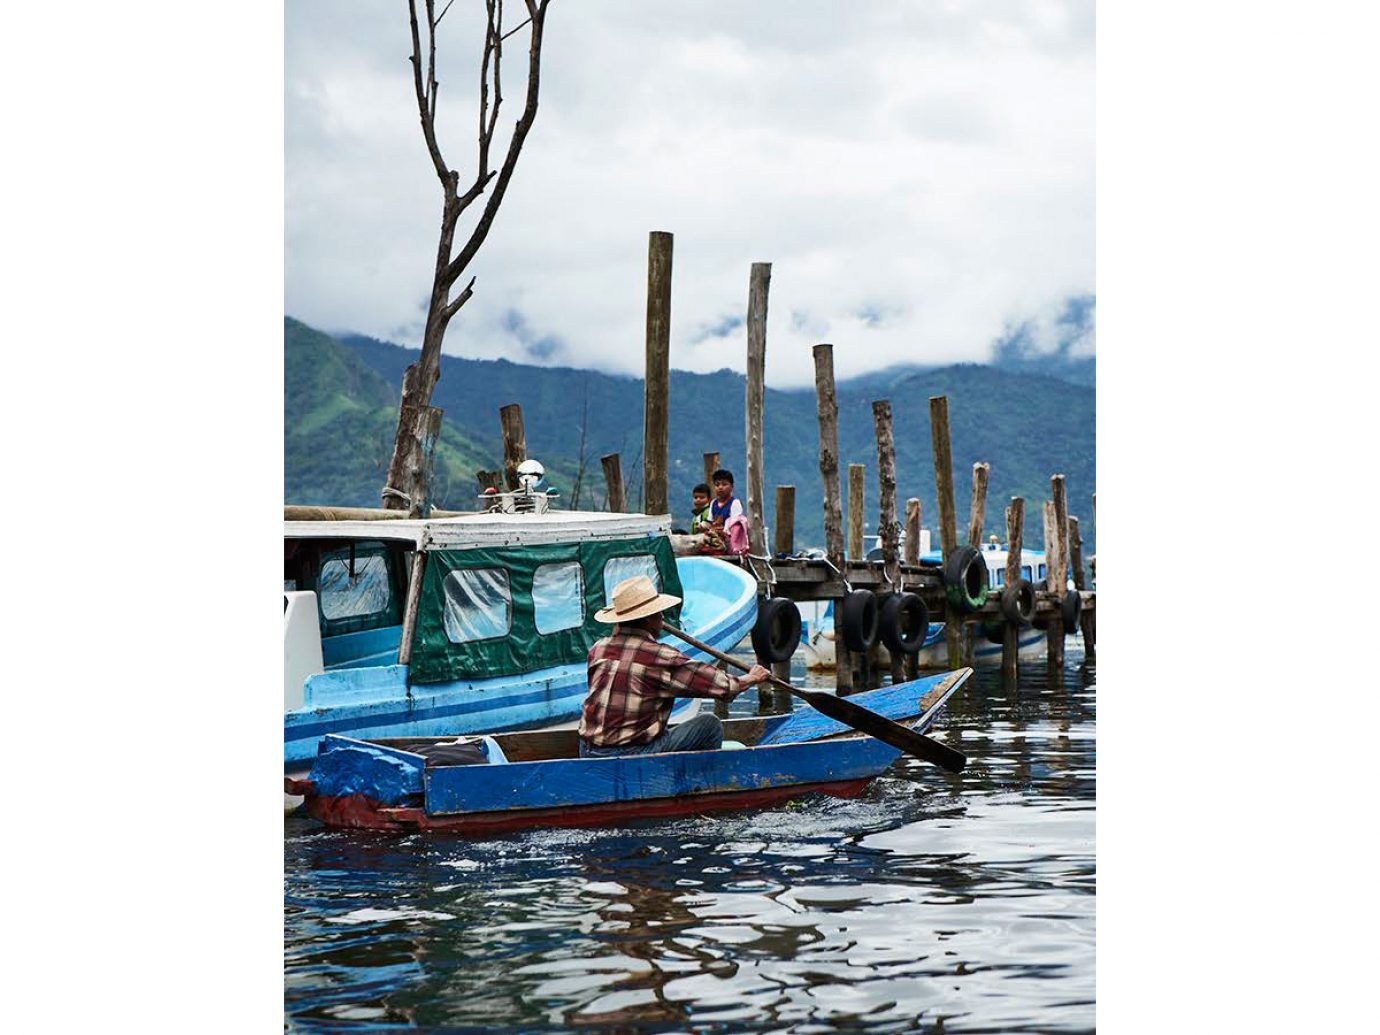 Trip Ideas sky water Boat outdoor vehicle watercraft rowing boating watercraft sailboat gondola sail paddle